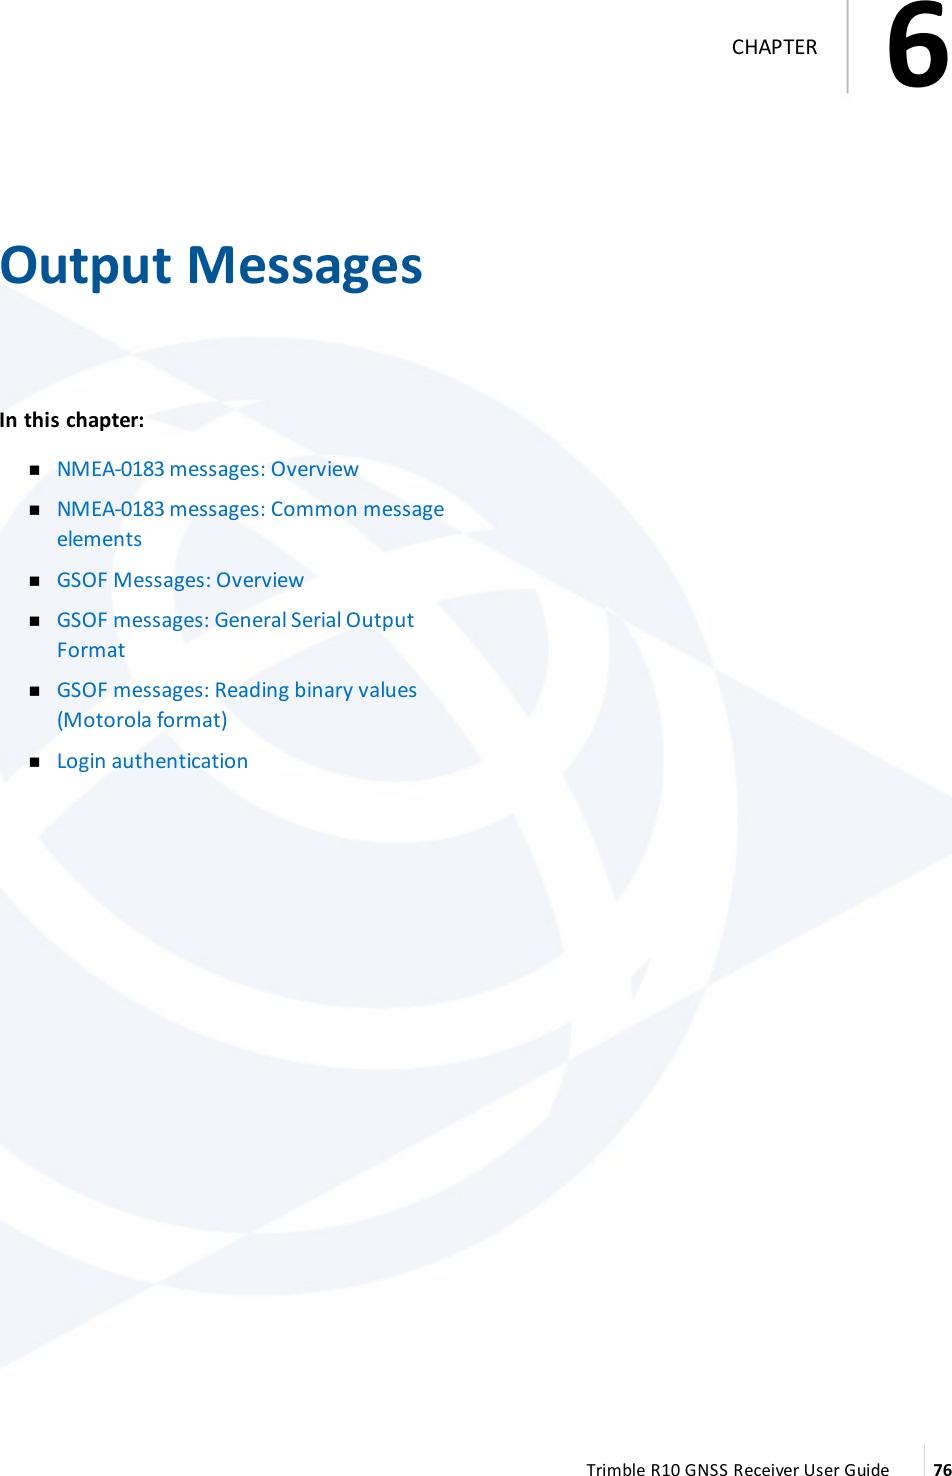 Trimble 9091191 GNSS Receiver+900 MHz+Wi-Fi+Bluetooth User Manual